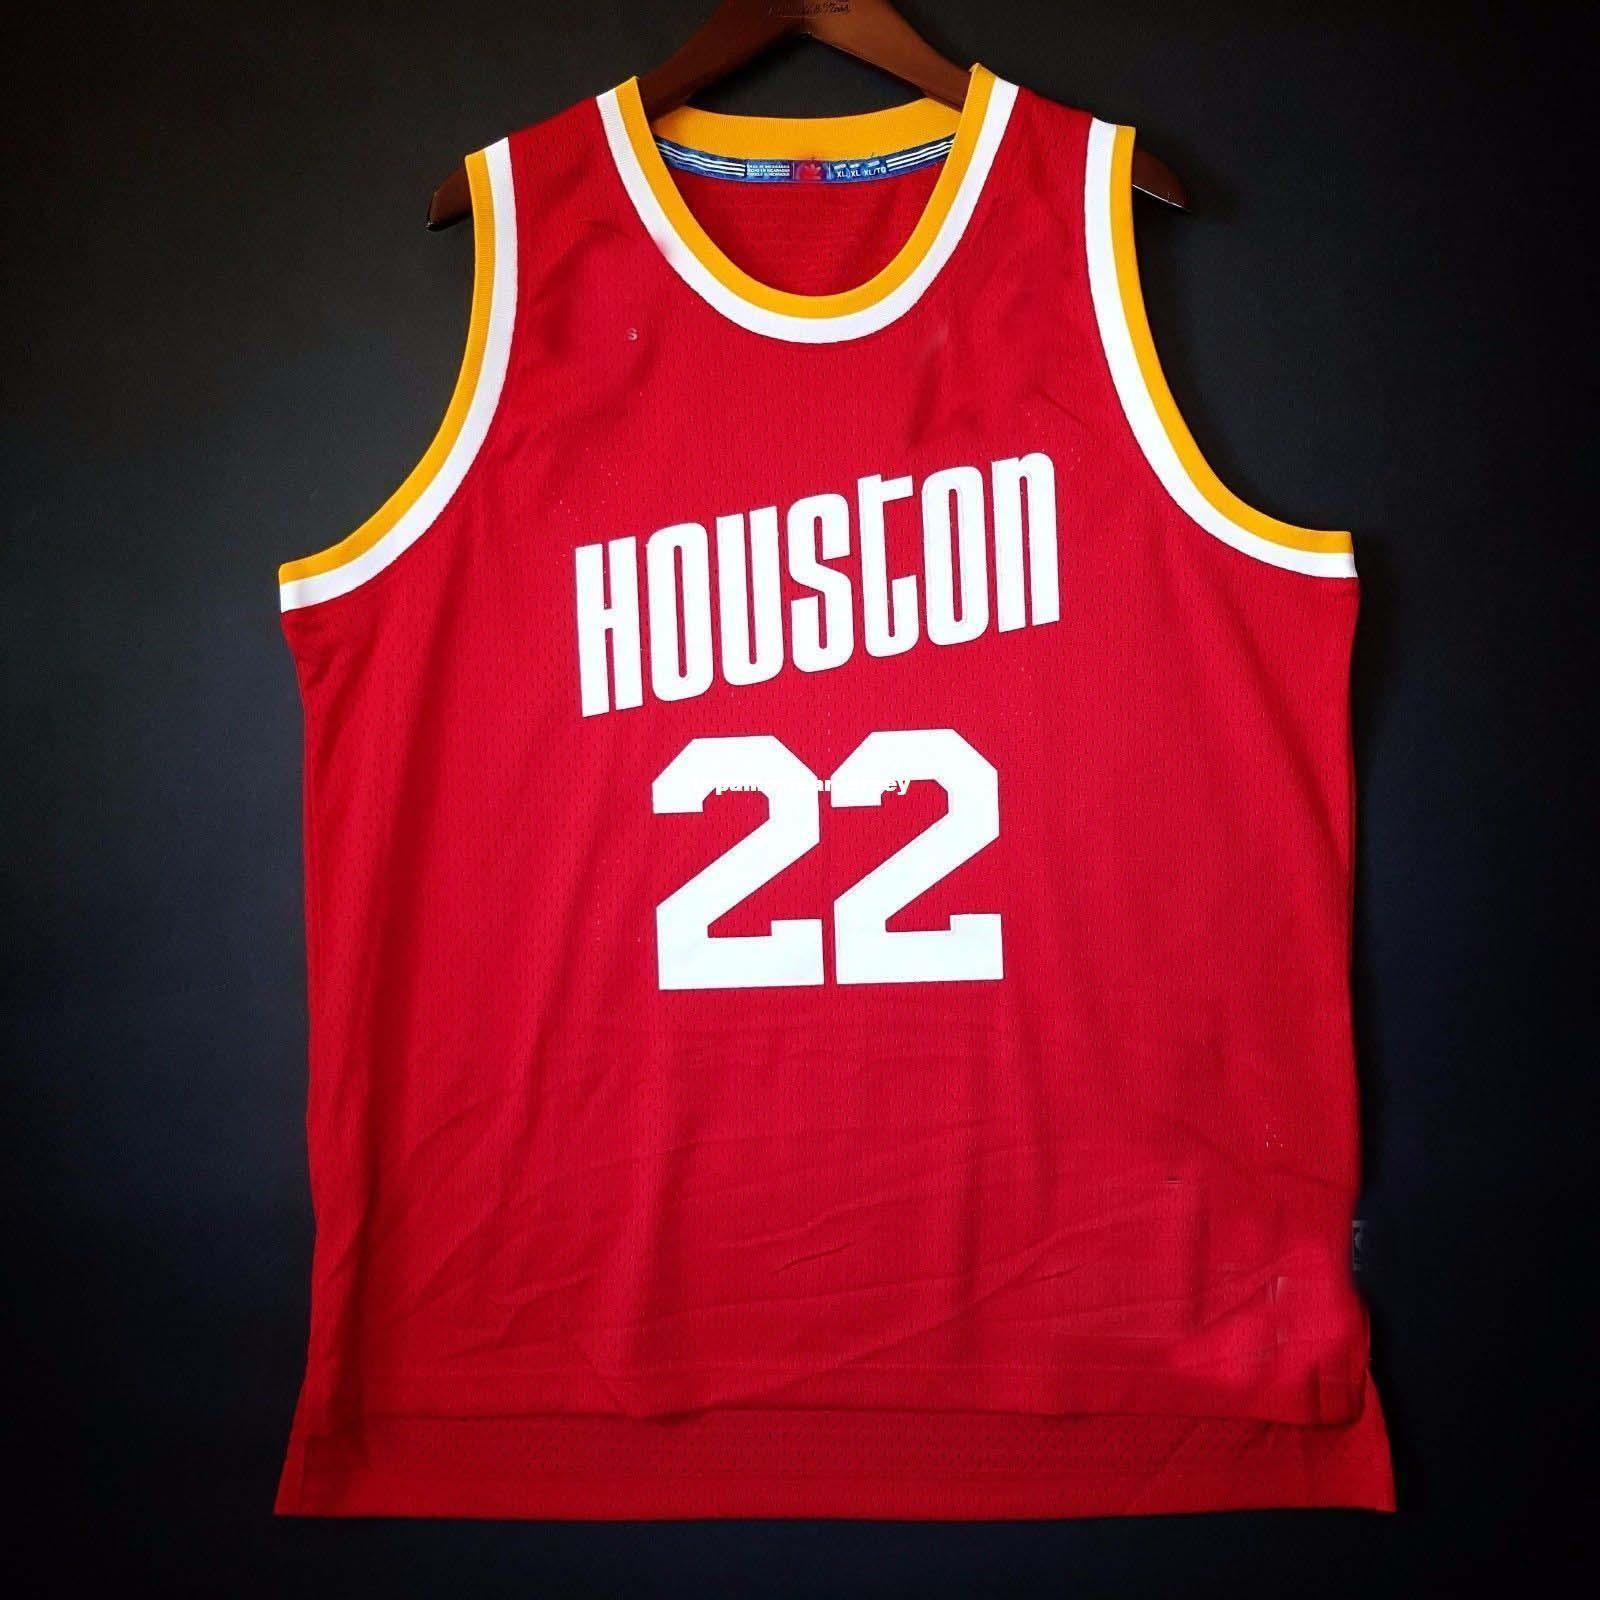 100% Stitched Clyde The Glide Drexler #22 Soul vest Sewn Jersey Red Mens Vest Size XS-6XL Stitched basketball Jerseys Ncaa